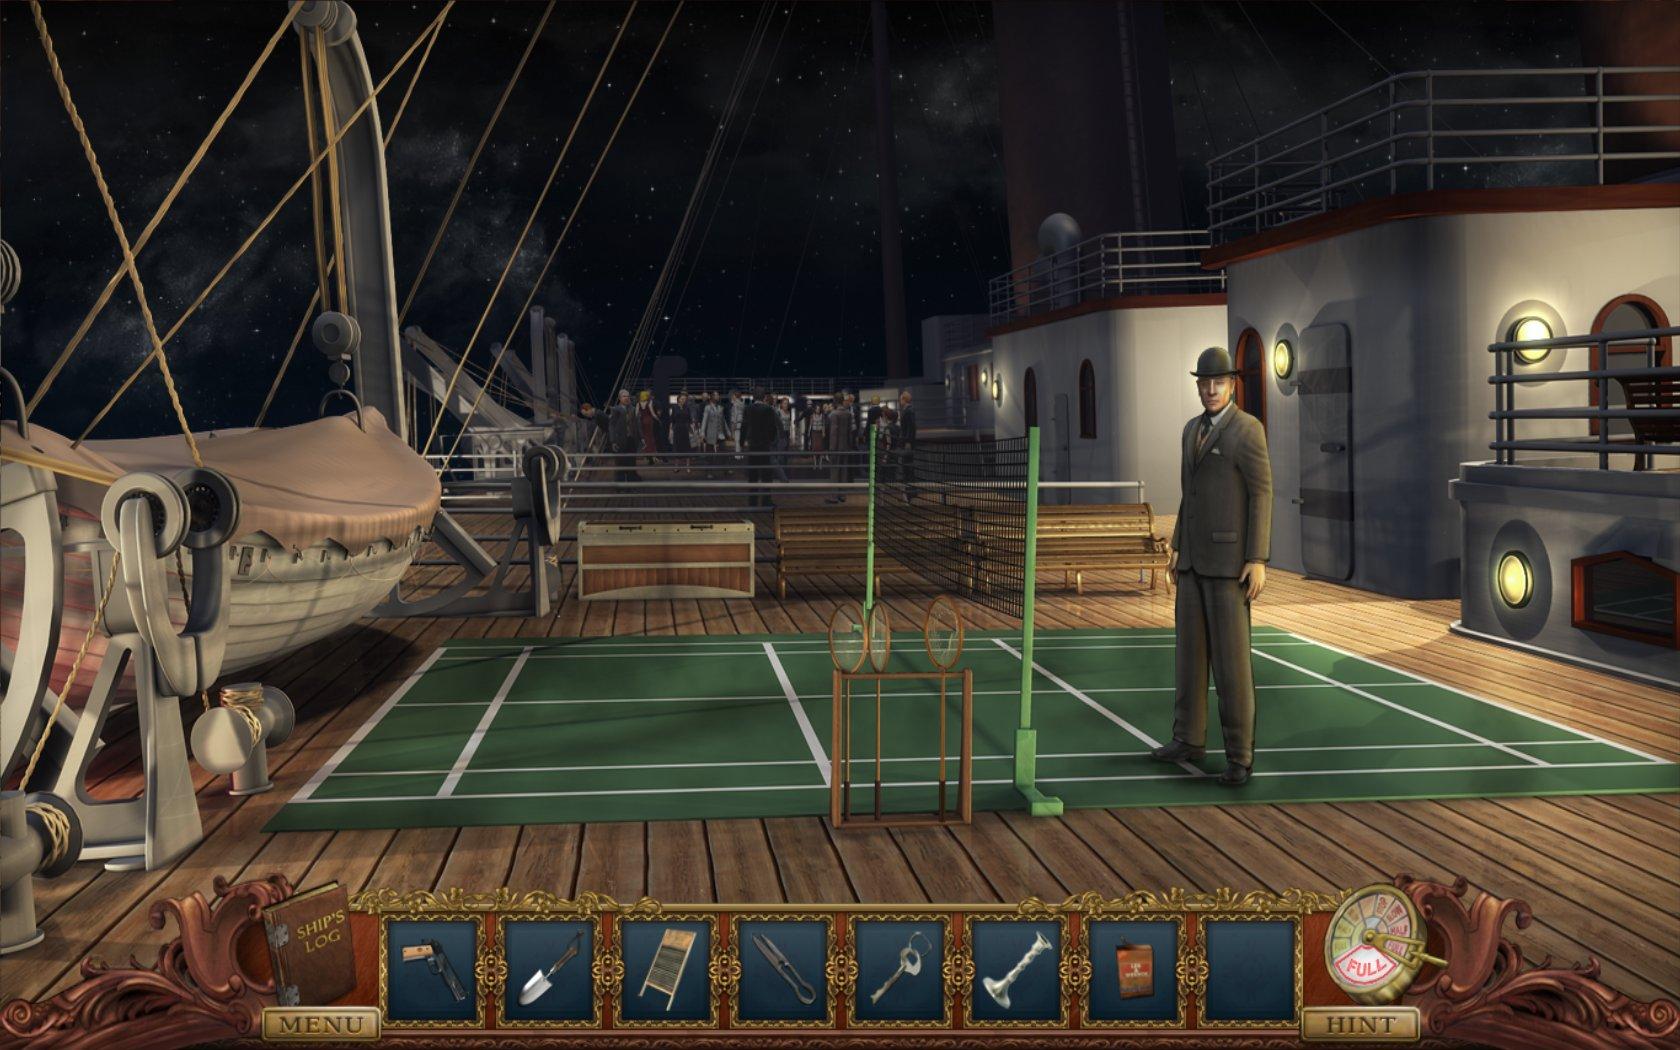 побег с корабля фото словам